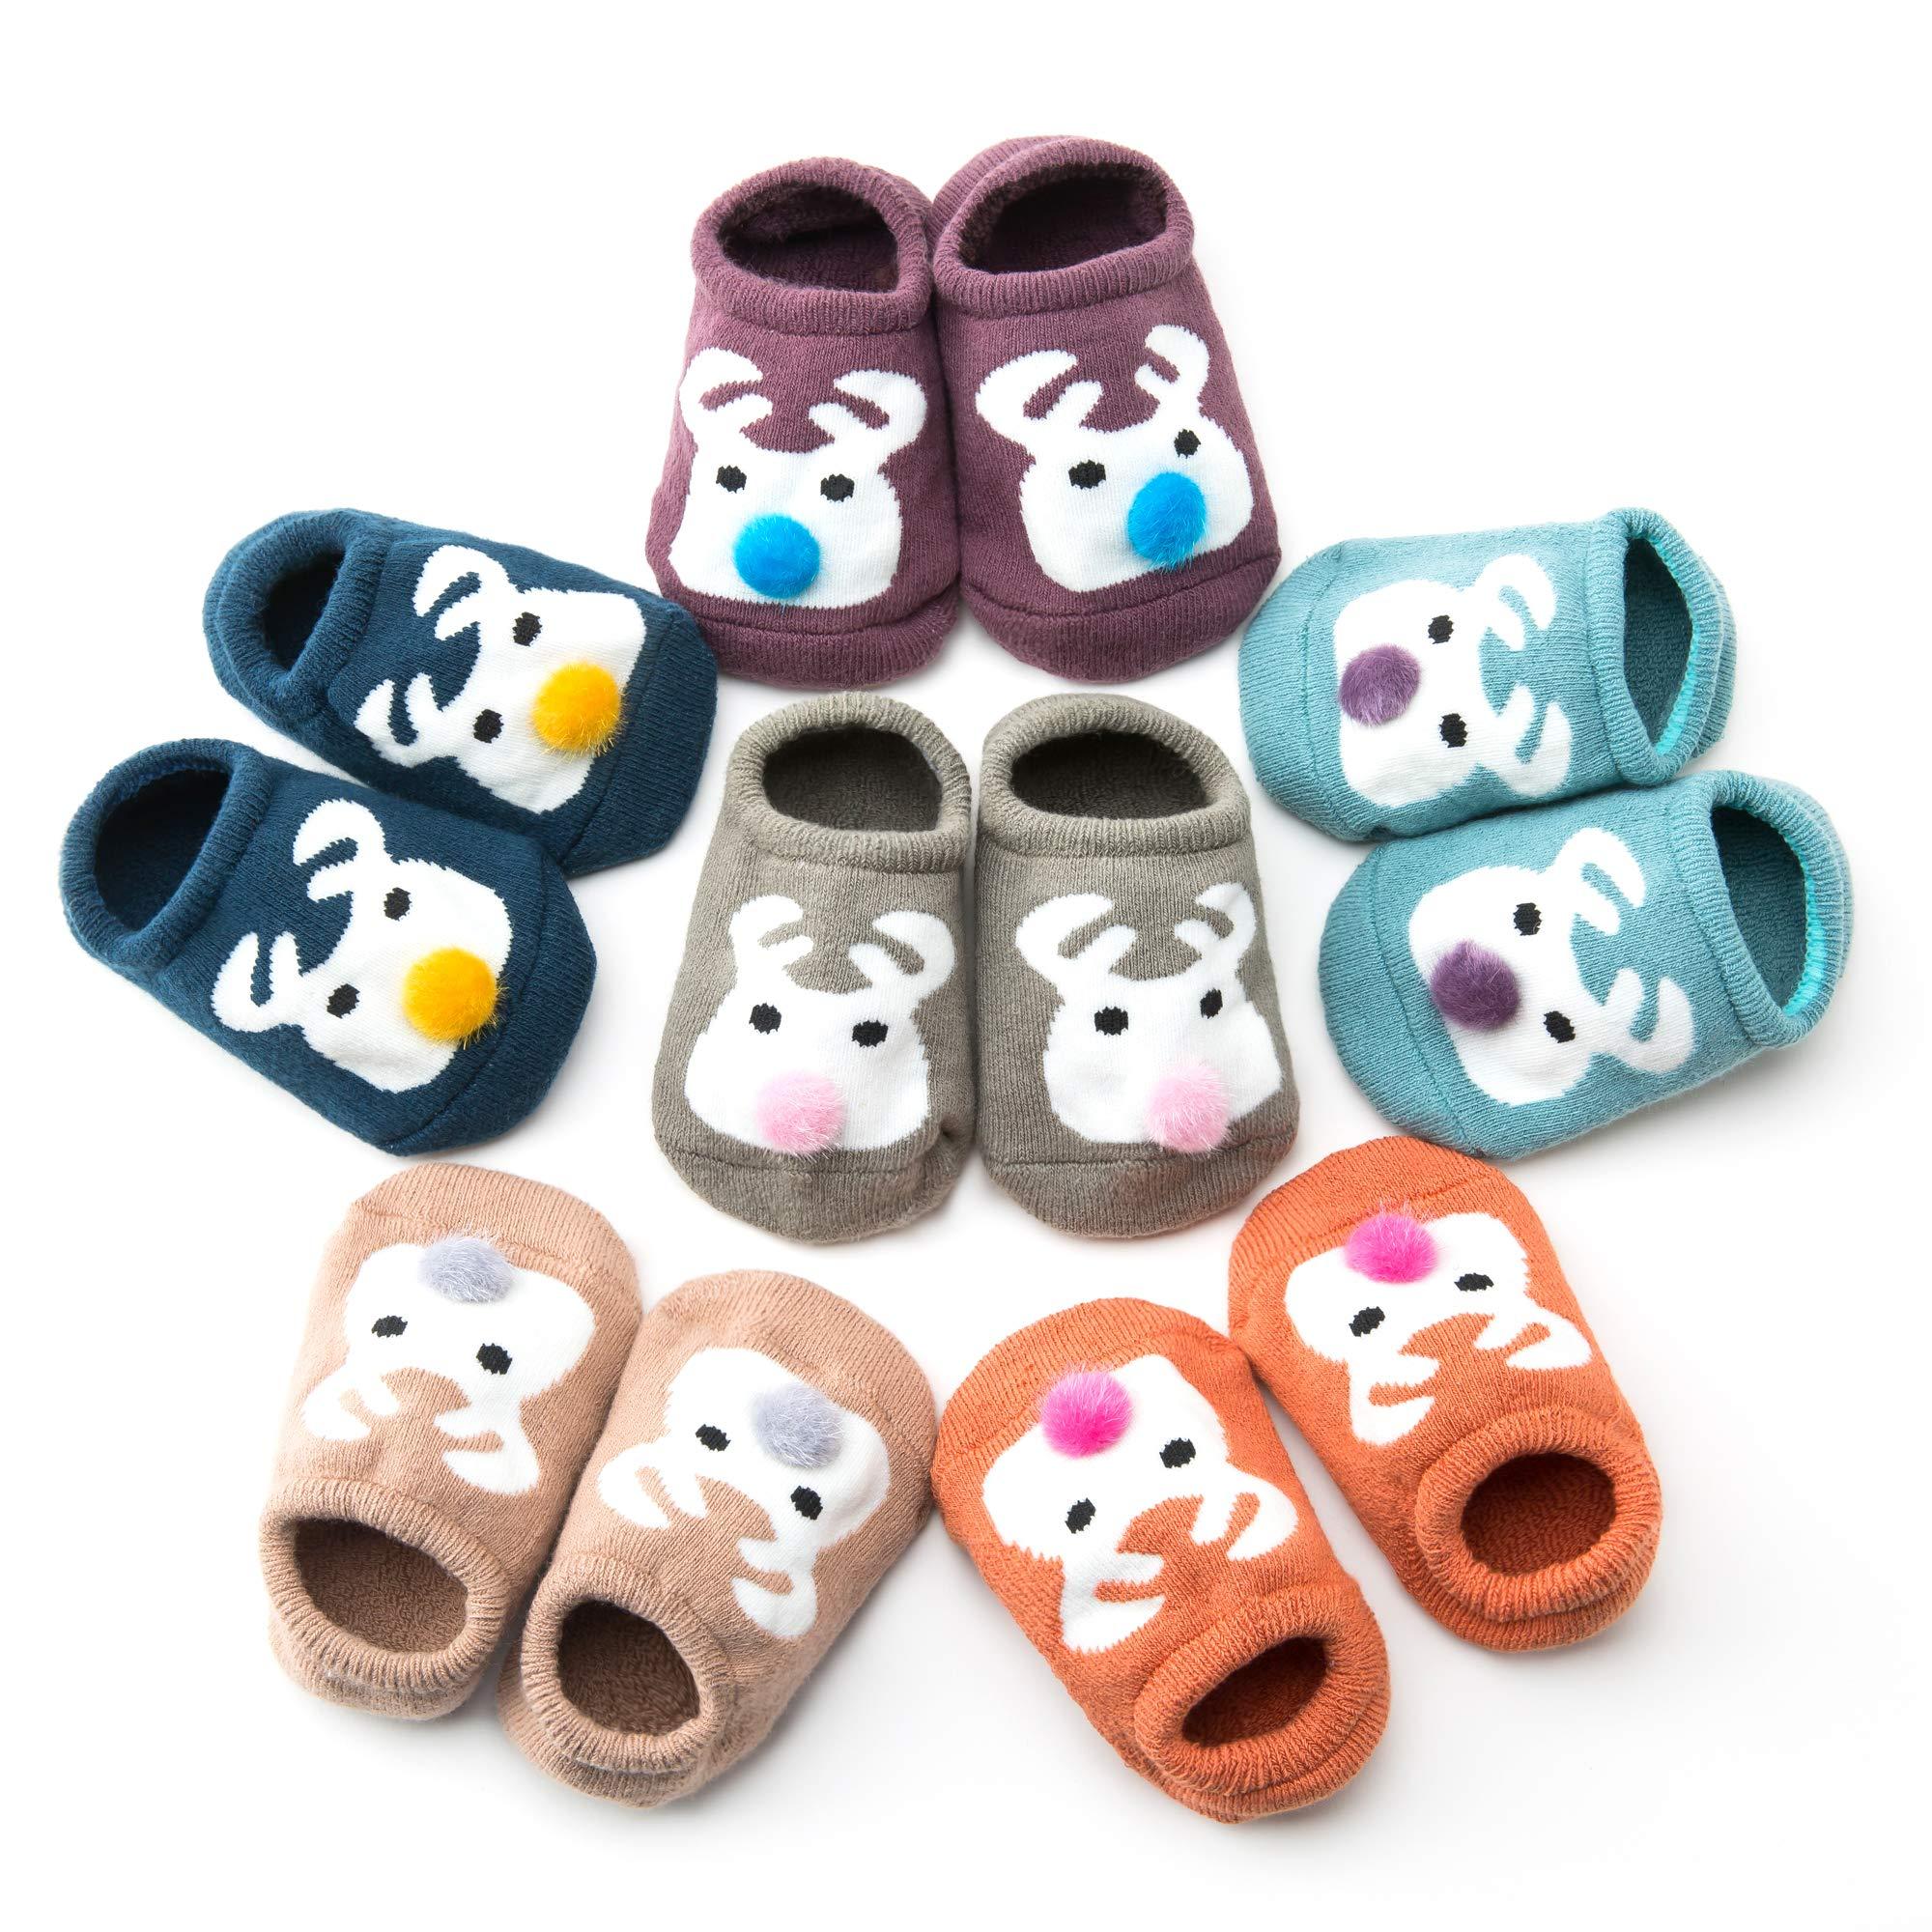 WONYERED 6 Pairs Antiskid Ankle Baby Socks Baby Floor Socks for Toddler Unisex Baby Gifts Set for Baby Girls or Boys